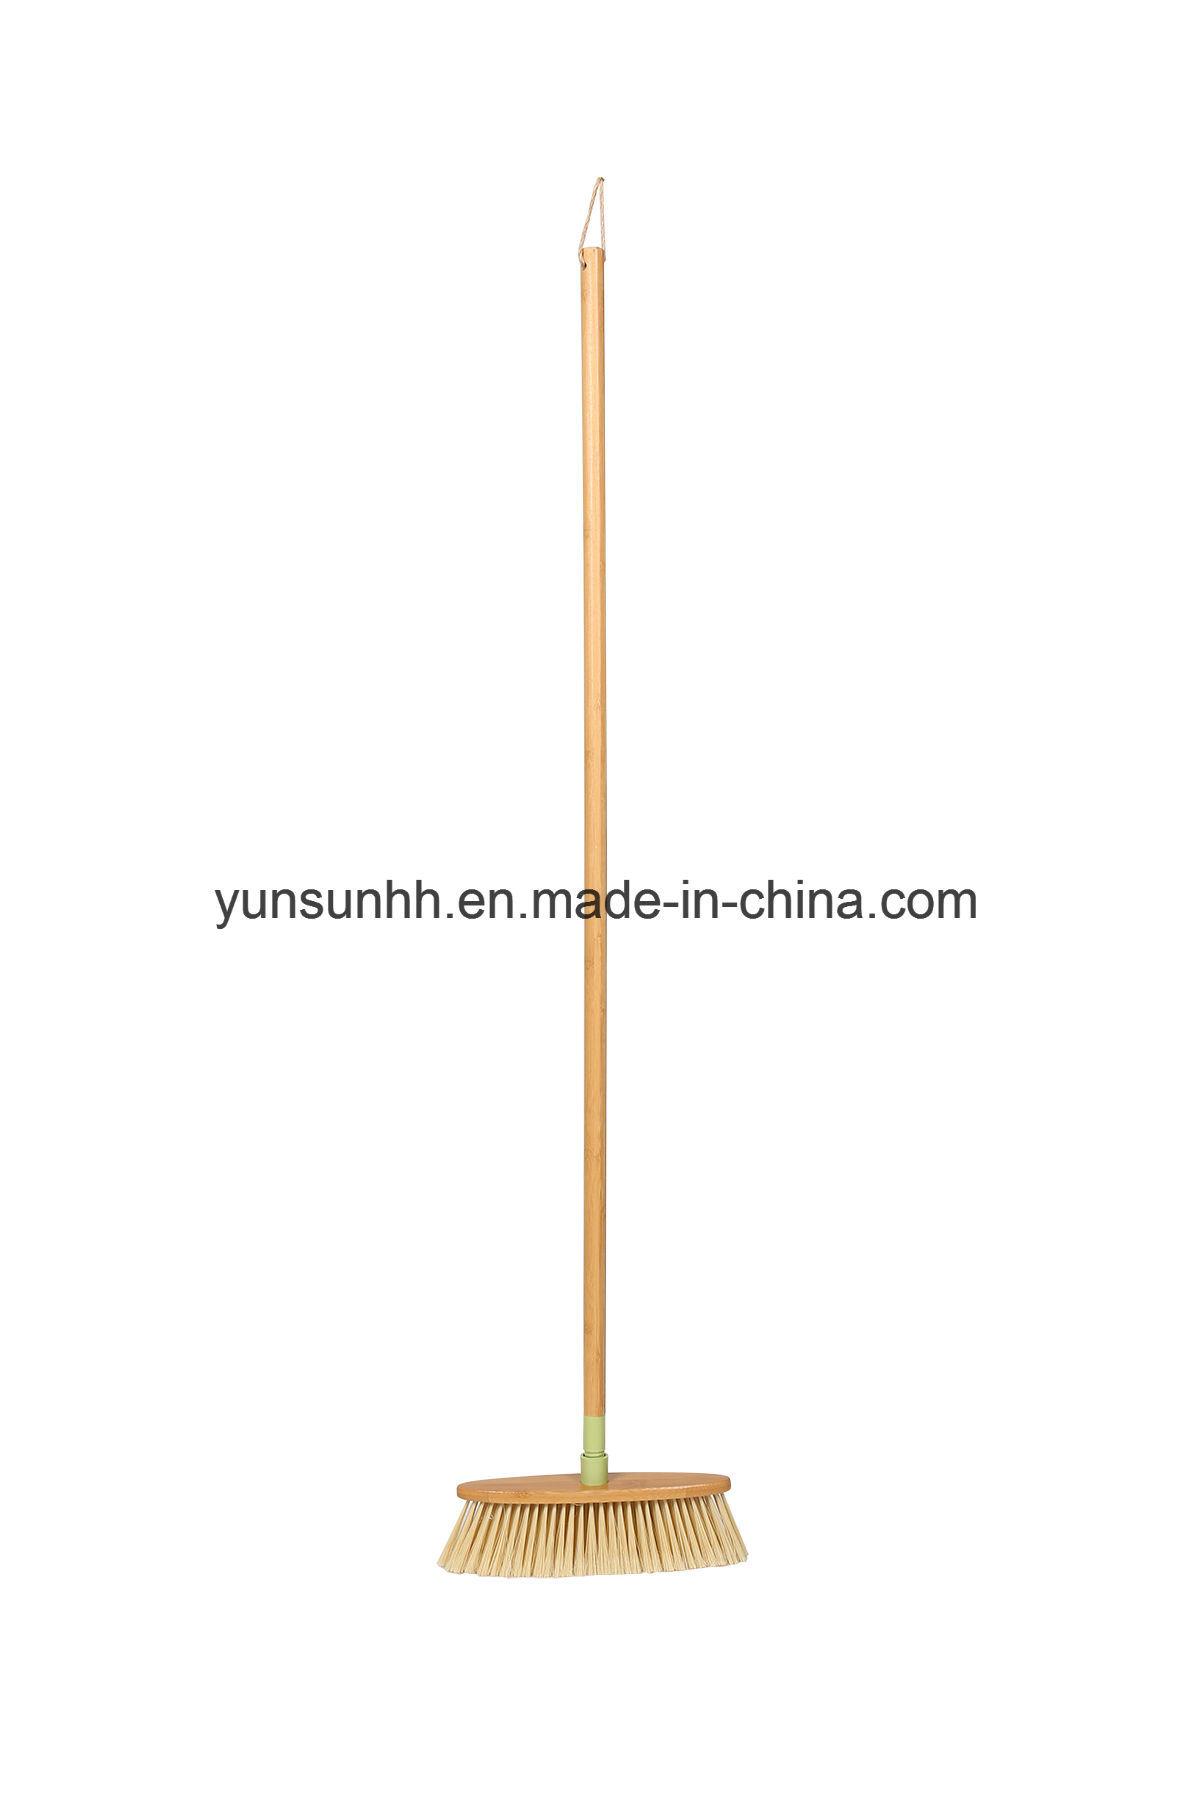 Broom, Cleaner Tool, Floor Brush/Broom